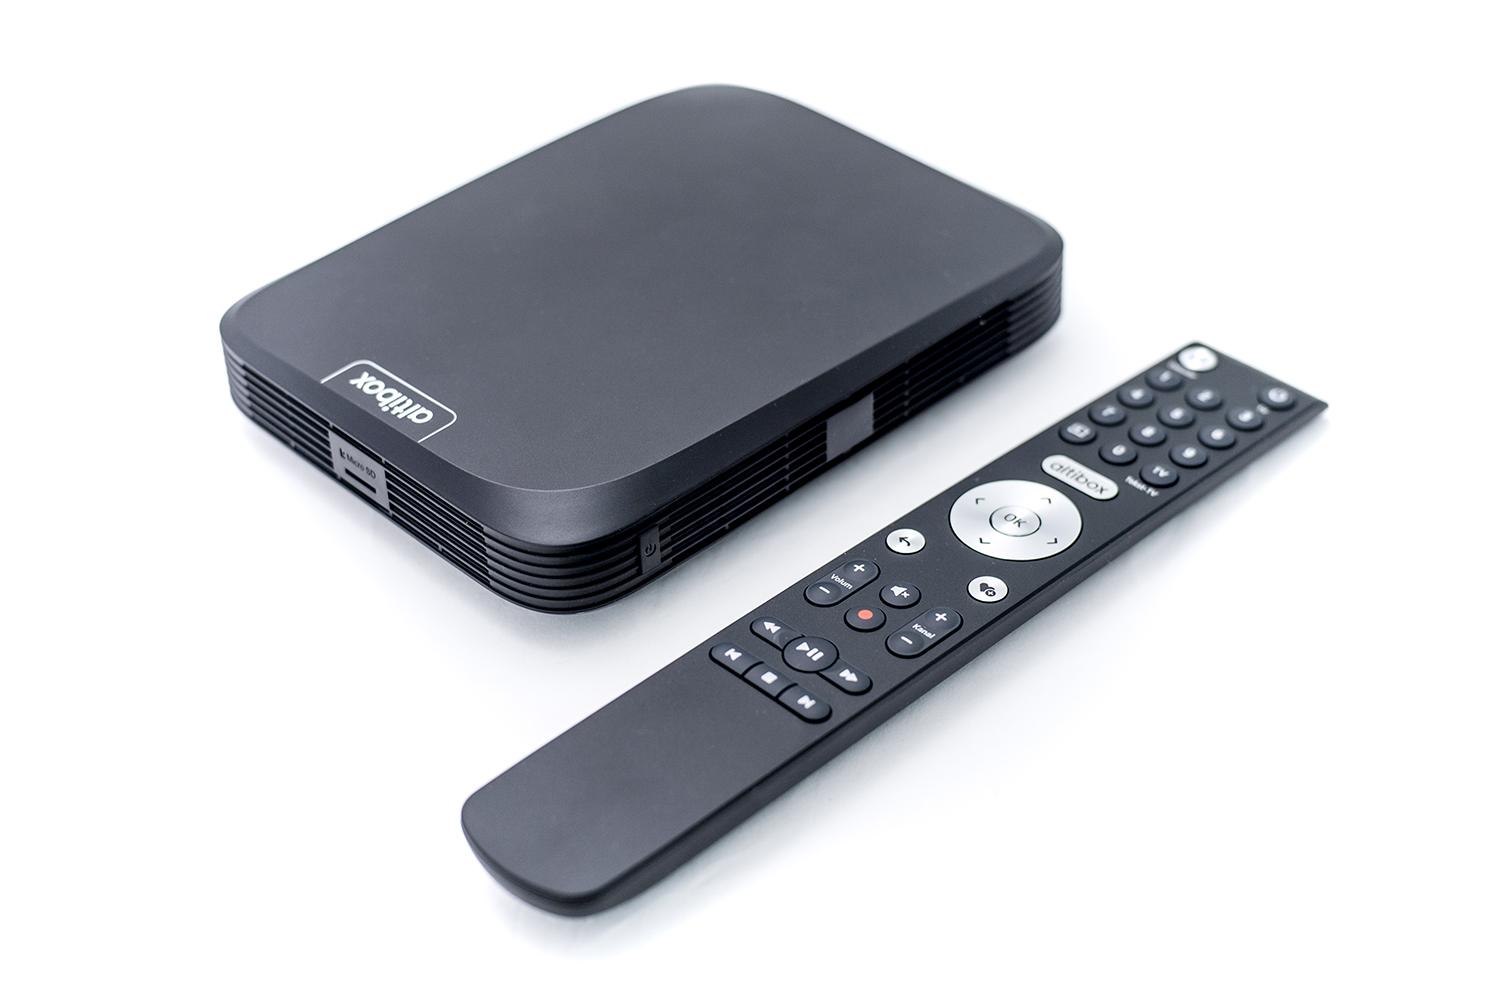 fjernkontroll og tv-boks